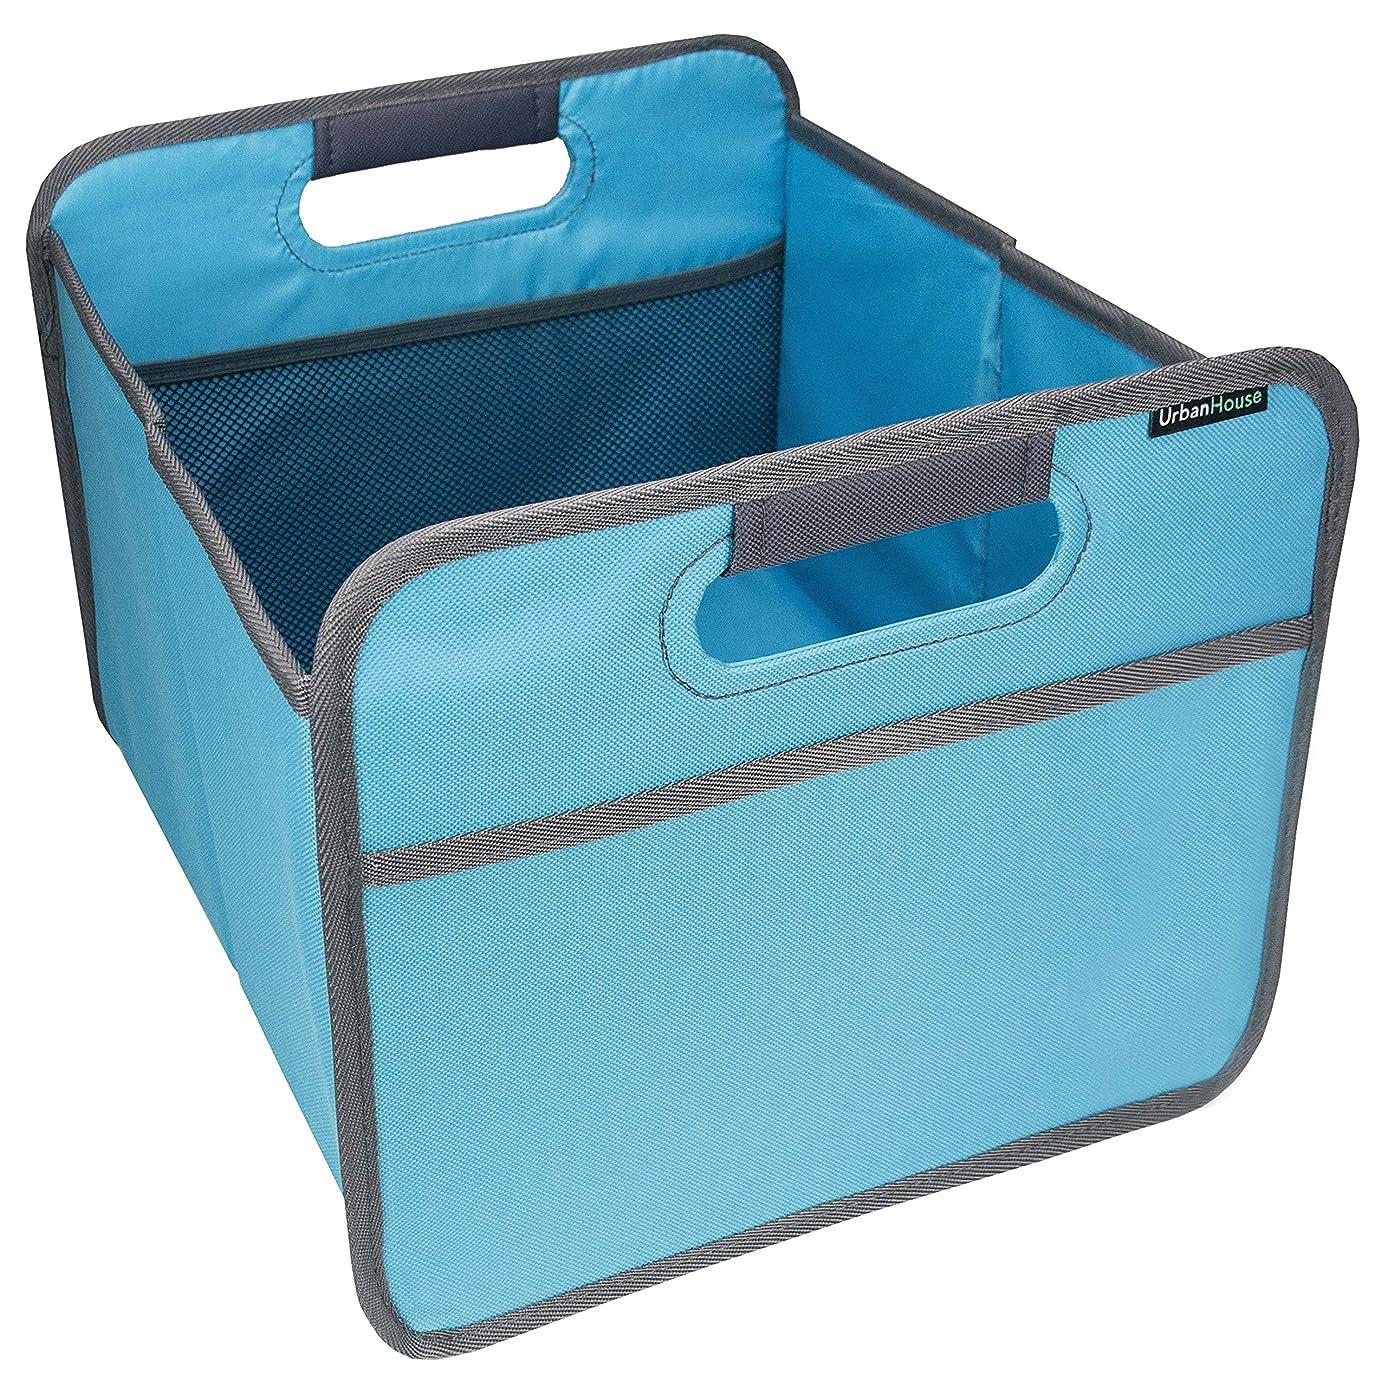 "Urban House AUH-TSG1LU Foldable Compact Storage Box and Caddy for Car and Trunk Organizer 14.5"" x 13"" x 10.75"" (6.6 Gallon capacity) -  Blue"